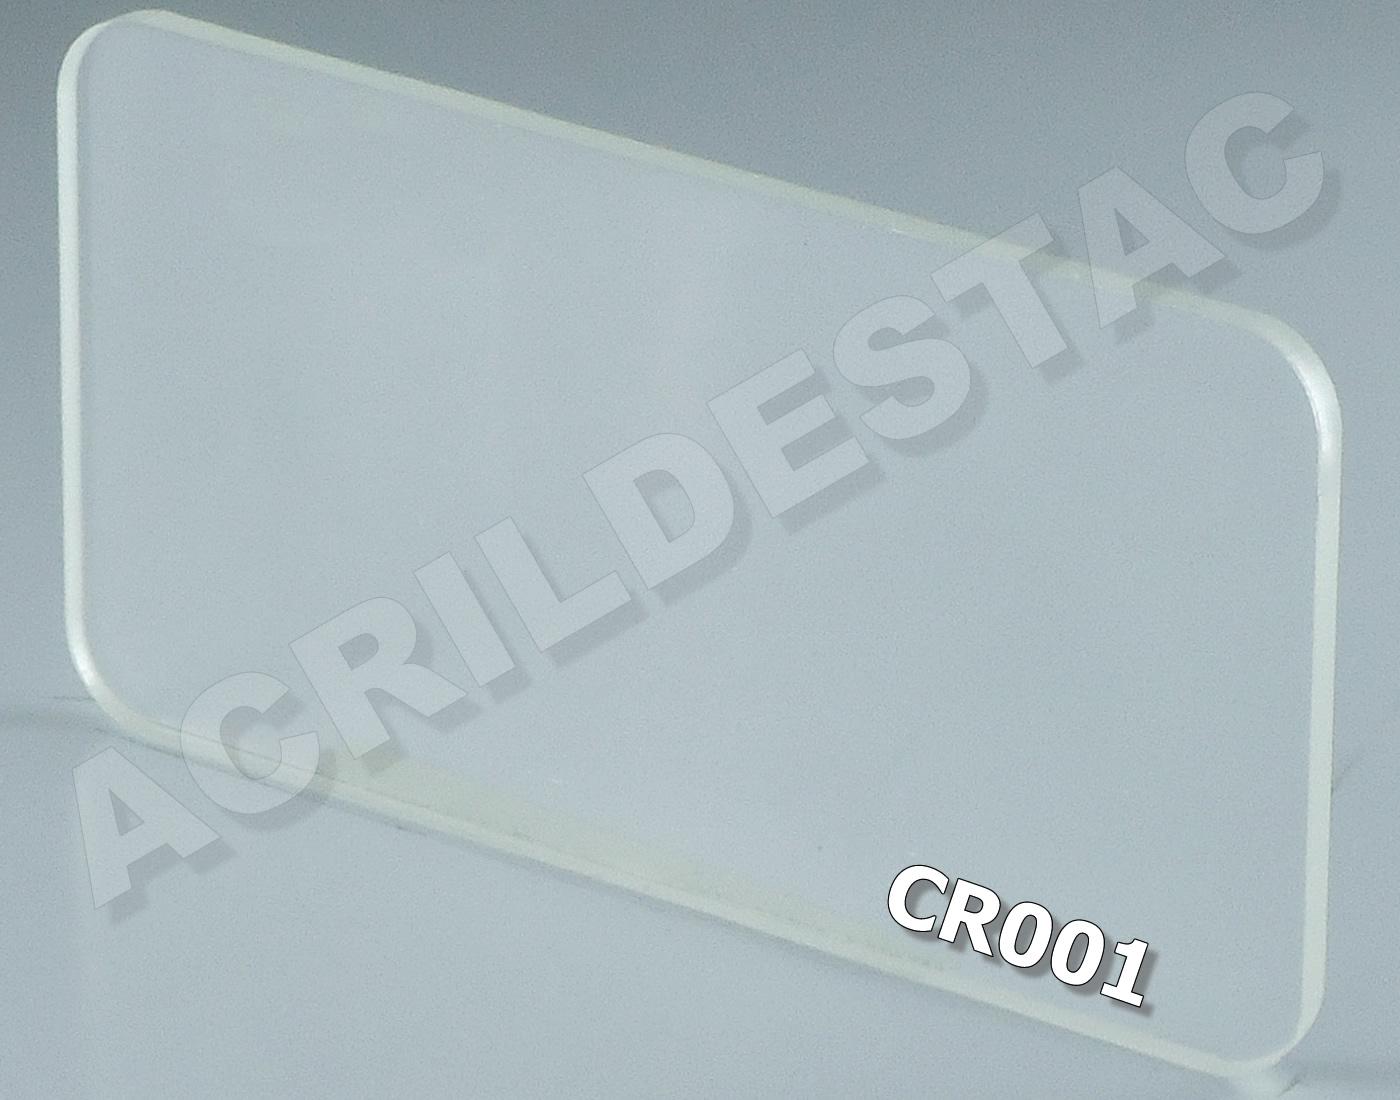 1 x 1 metro - 4mm - CRISTAL Transparente PL-CR001 -